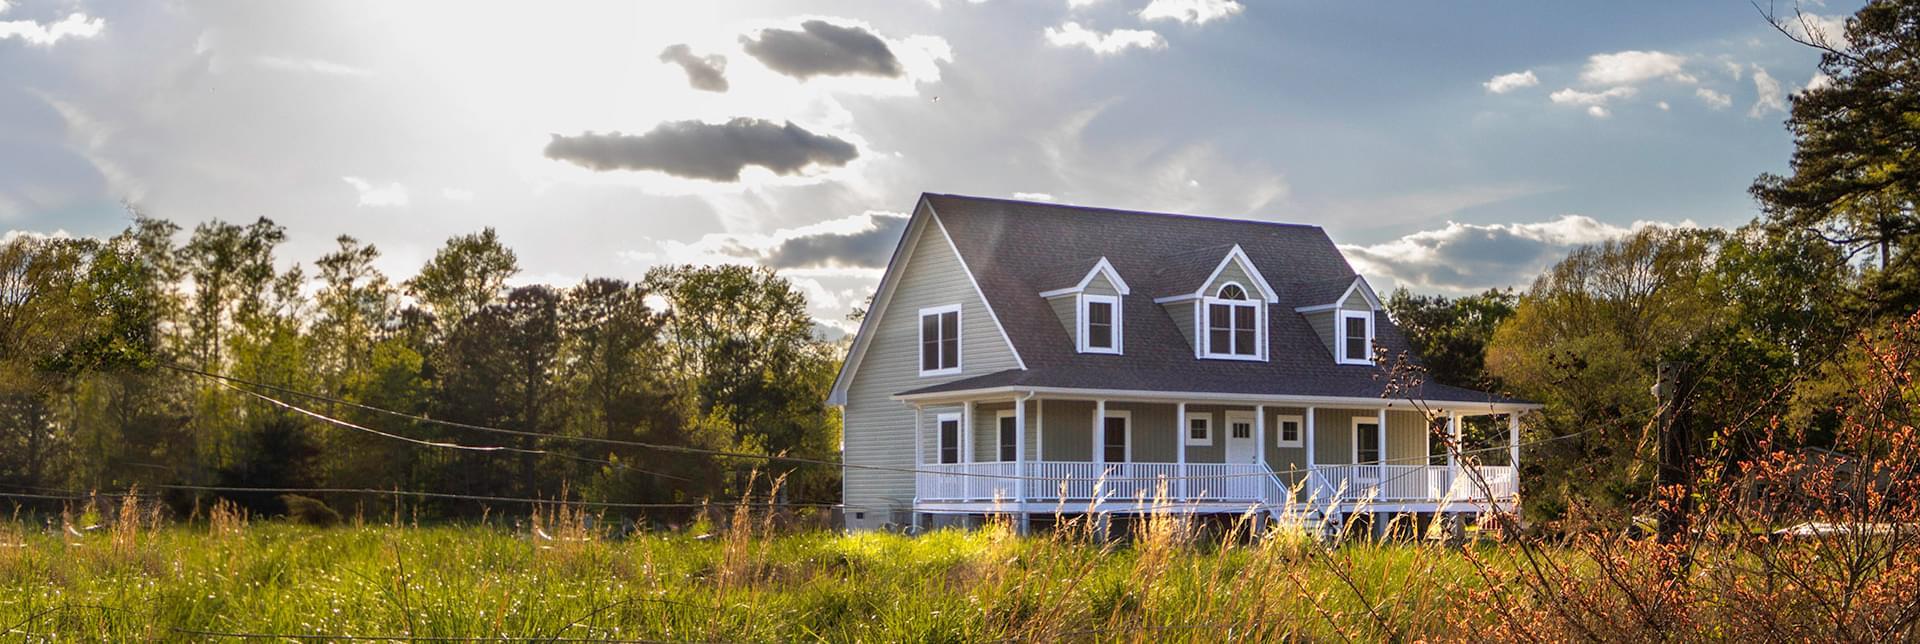 New Homes in Spotsylvania County VA